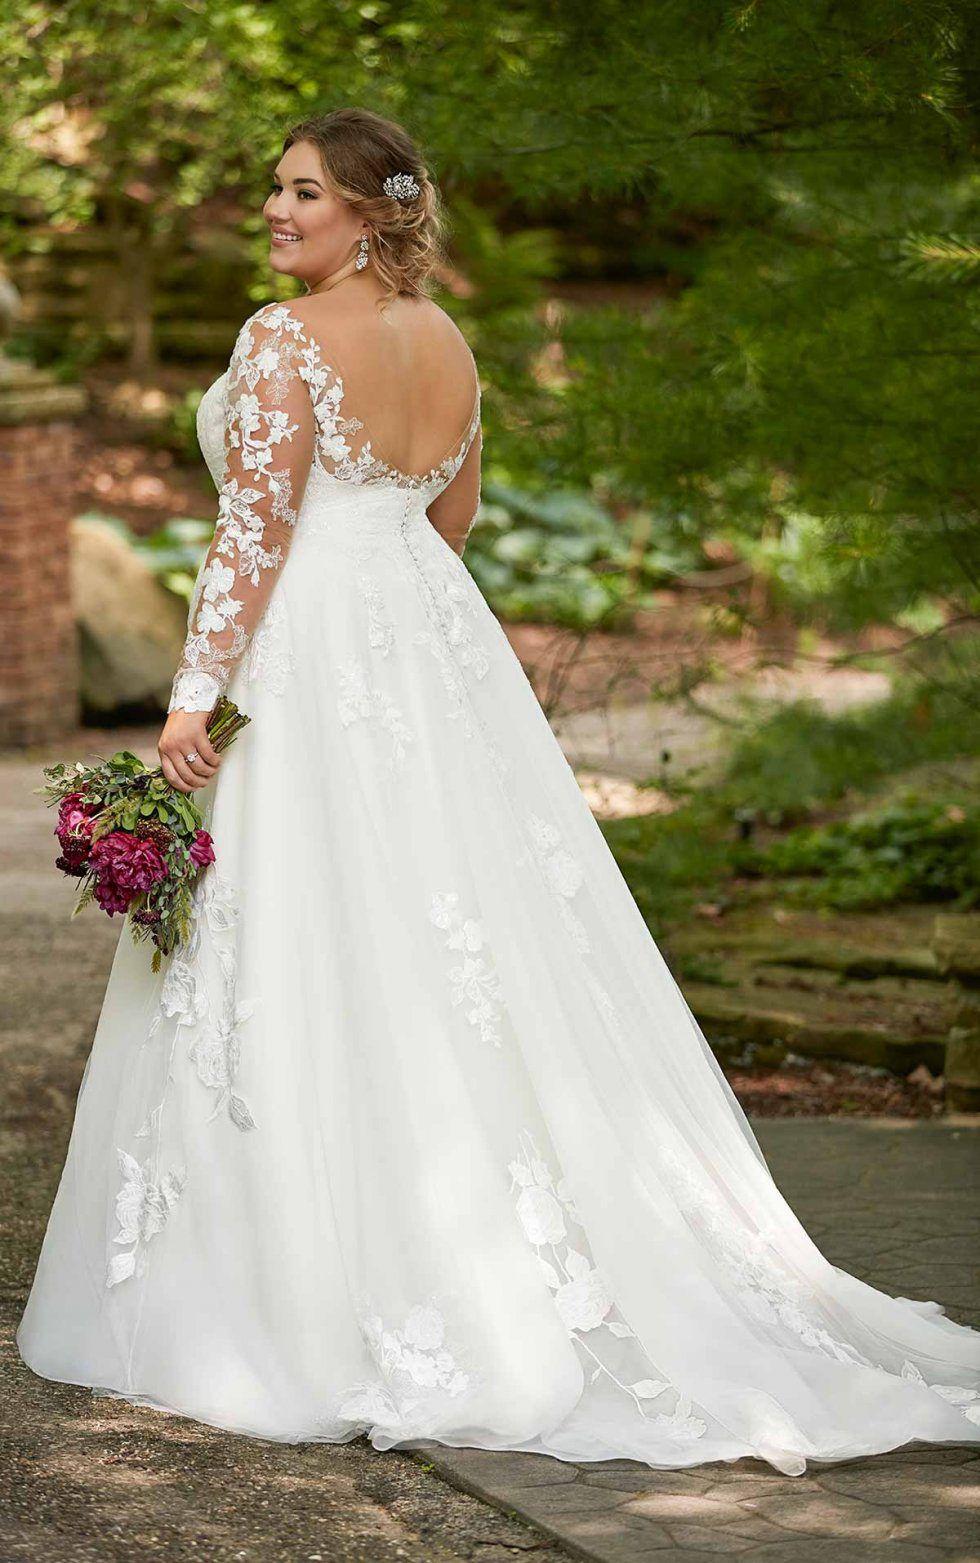 Long Sleeved Plus Size Wedding Dress Essense Of Australia Plus Size Wedding Gowns Wedding Dresses Essense Of Australia Wedding Dresses [ 1563 x 980 Pixel ]